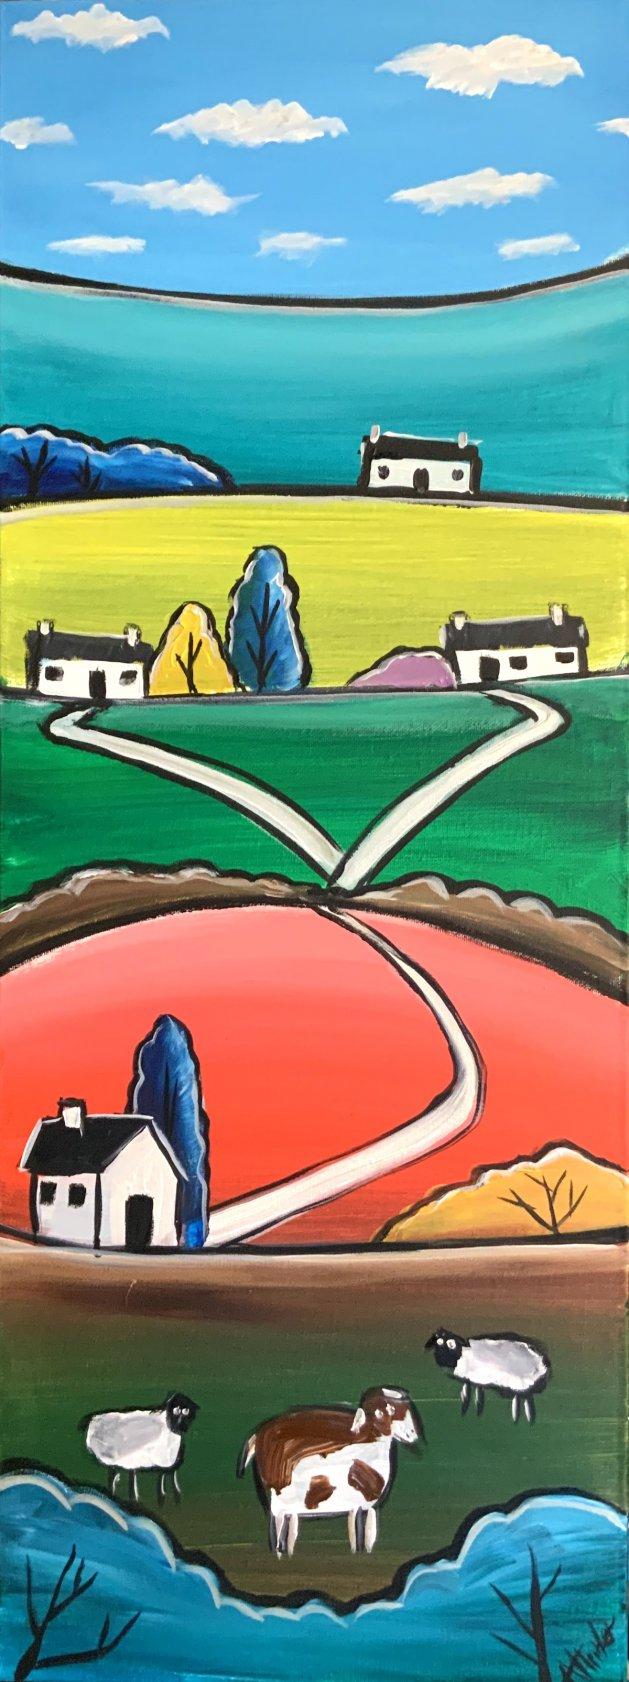 Joyful Hills. Original art by Aisha Haider